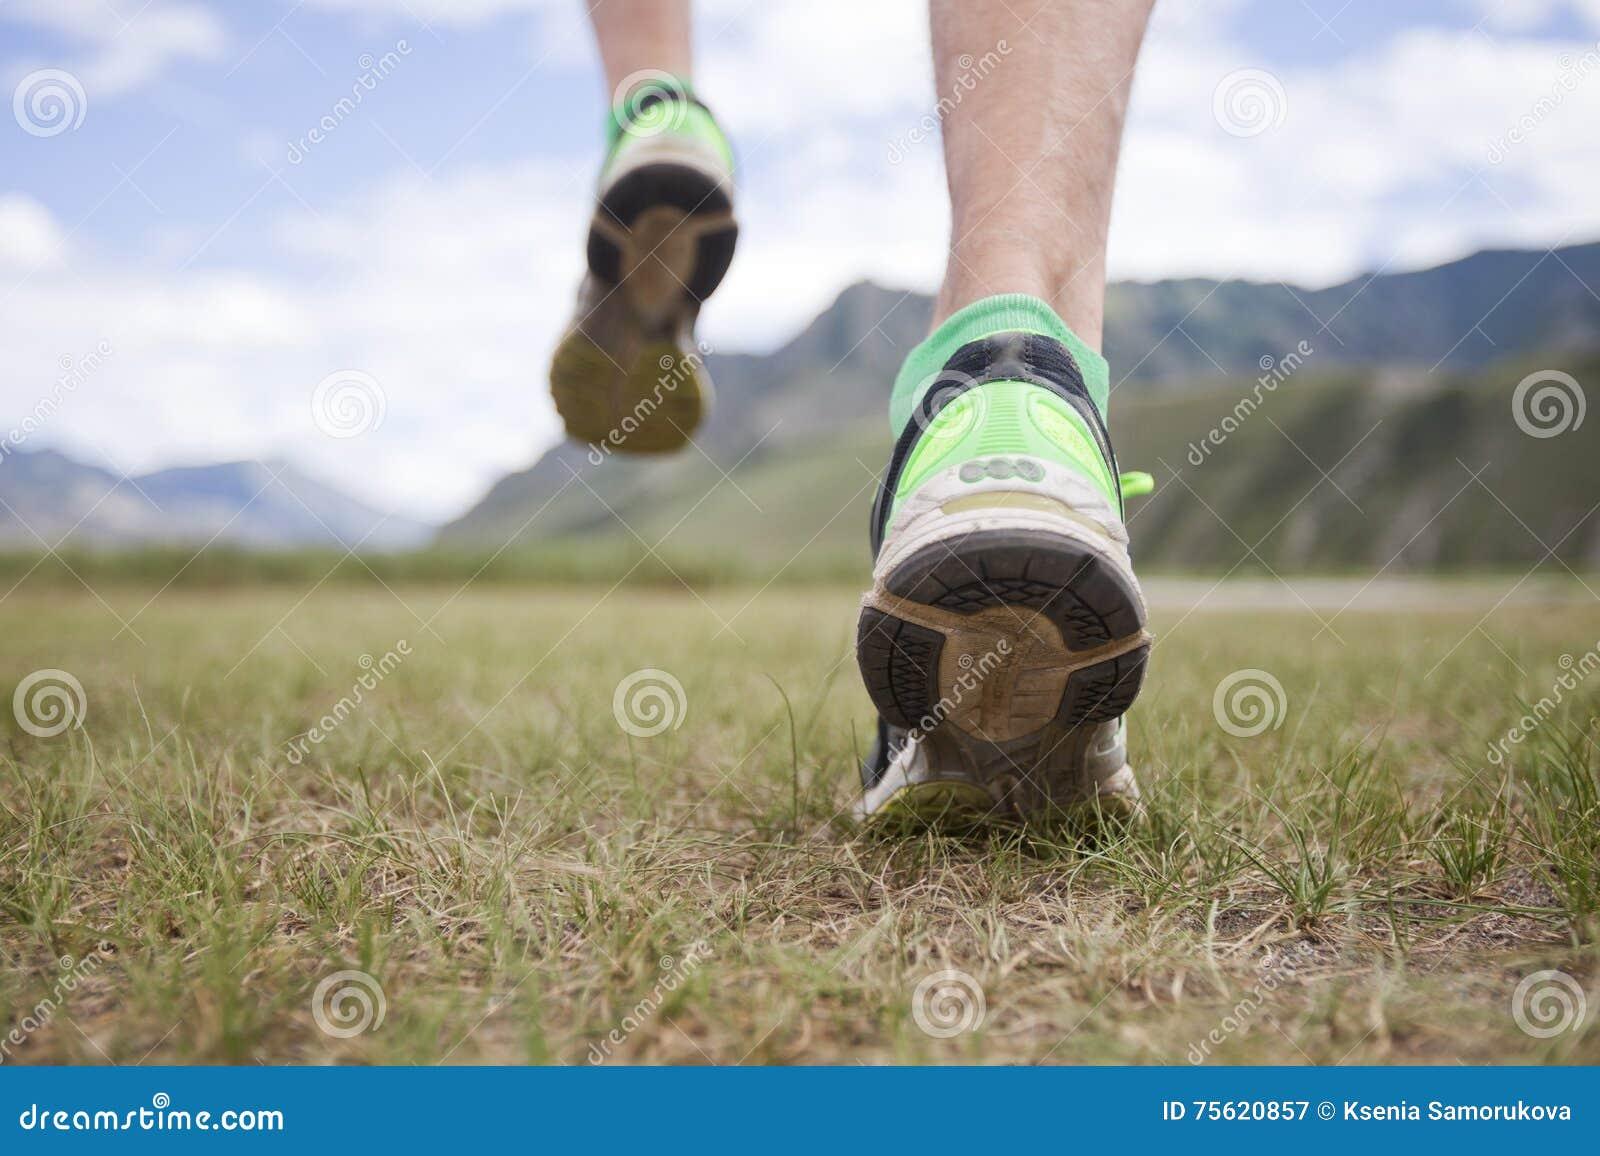 Pieds sur l herbe running